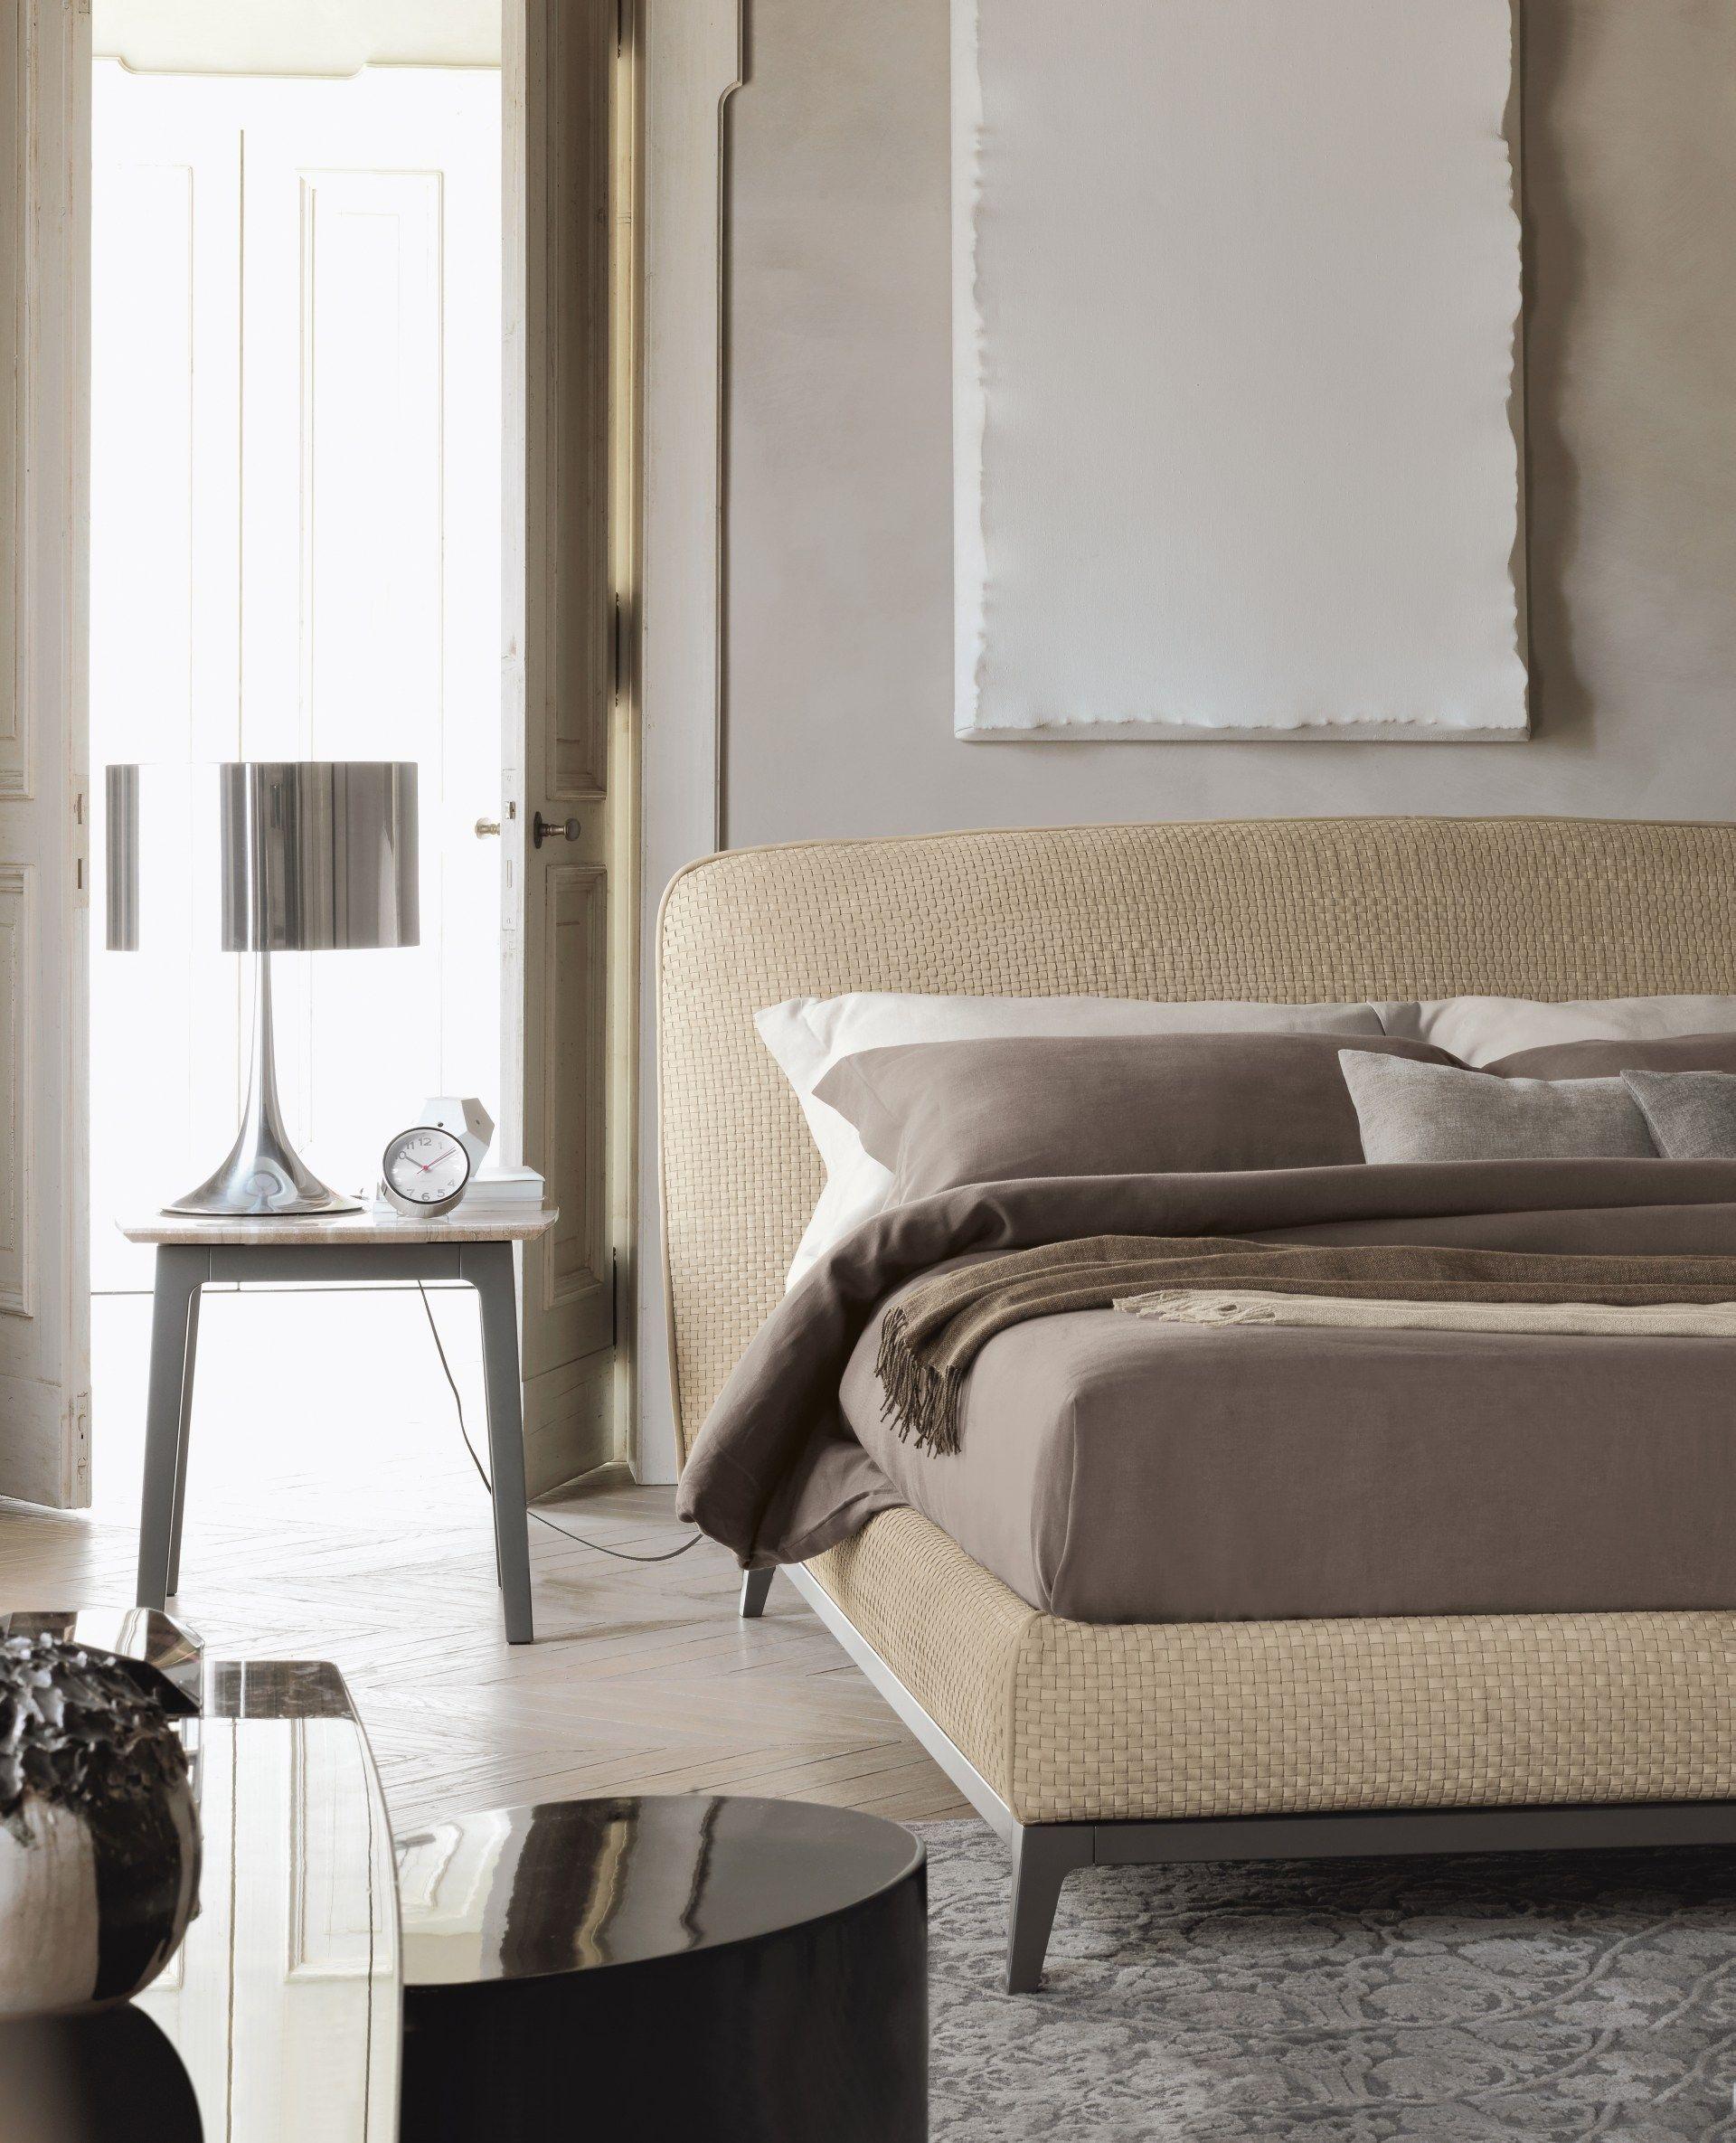 OLIVIER | Letto in pelle By Flou design Mario Dell\'Orto, Emanuela ...